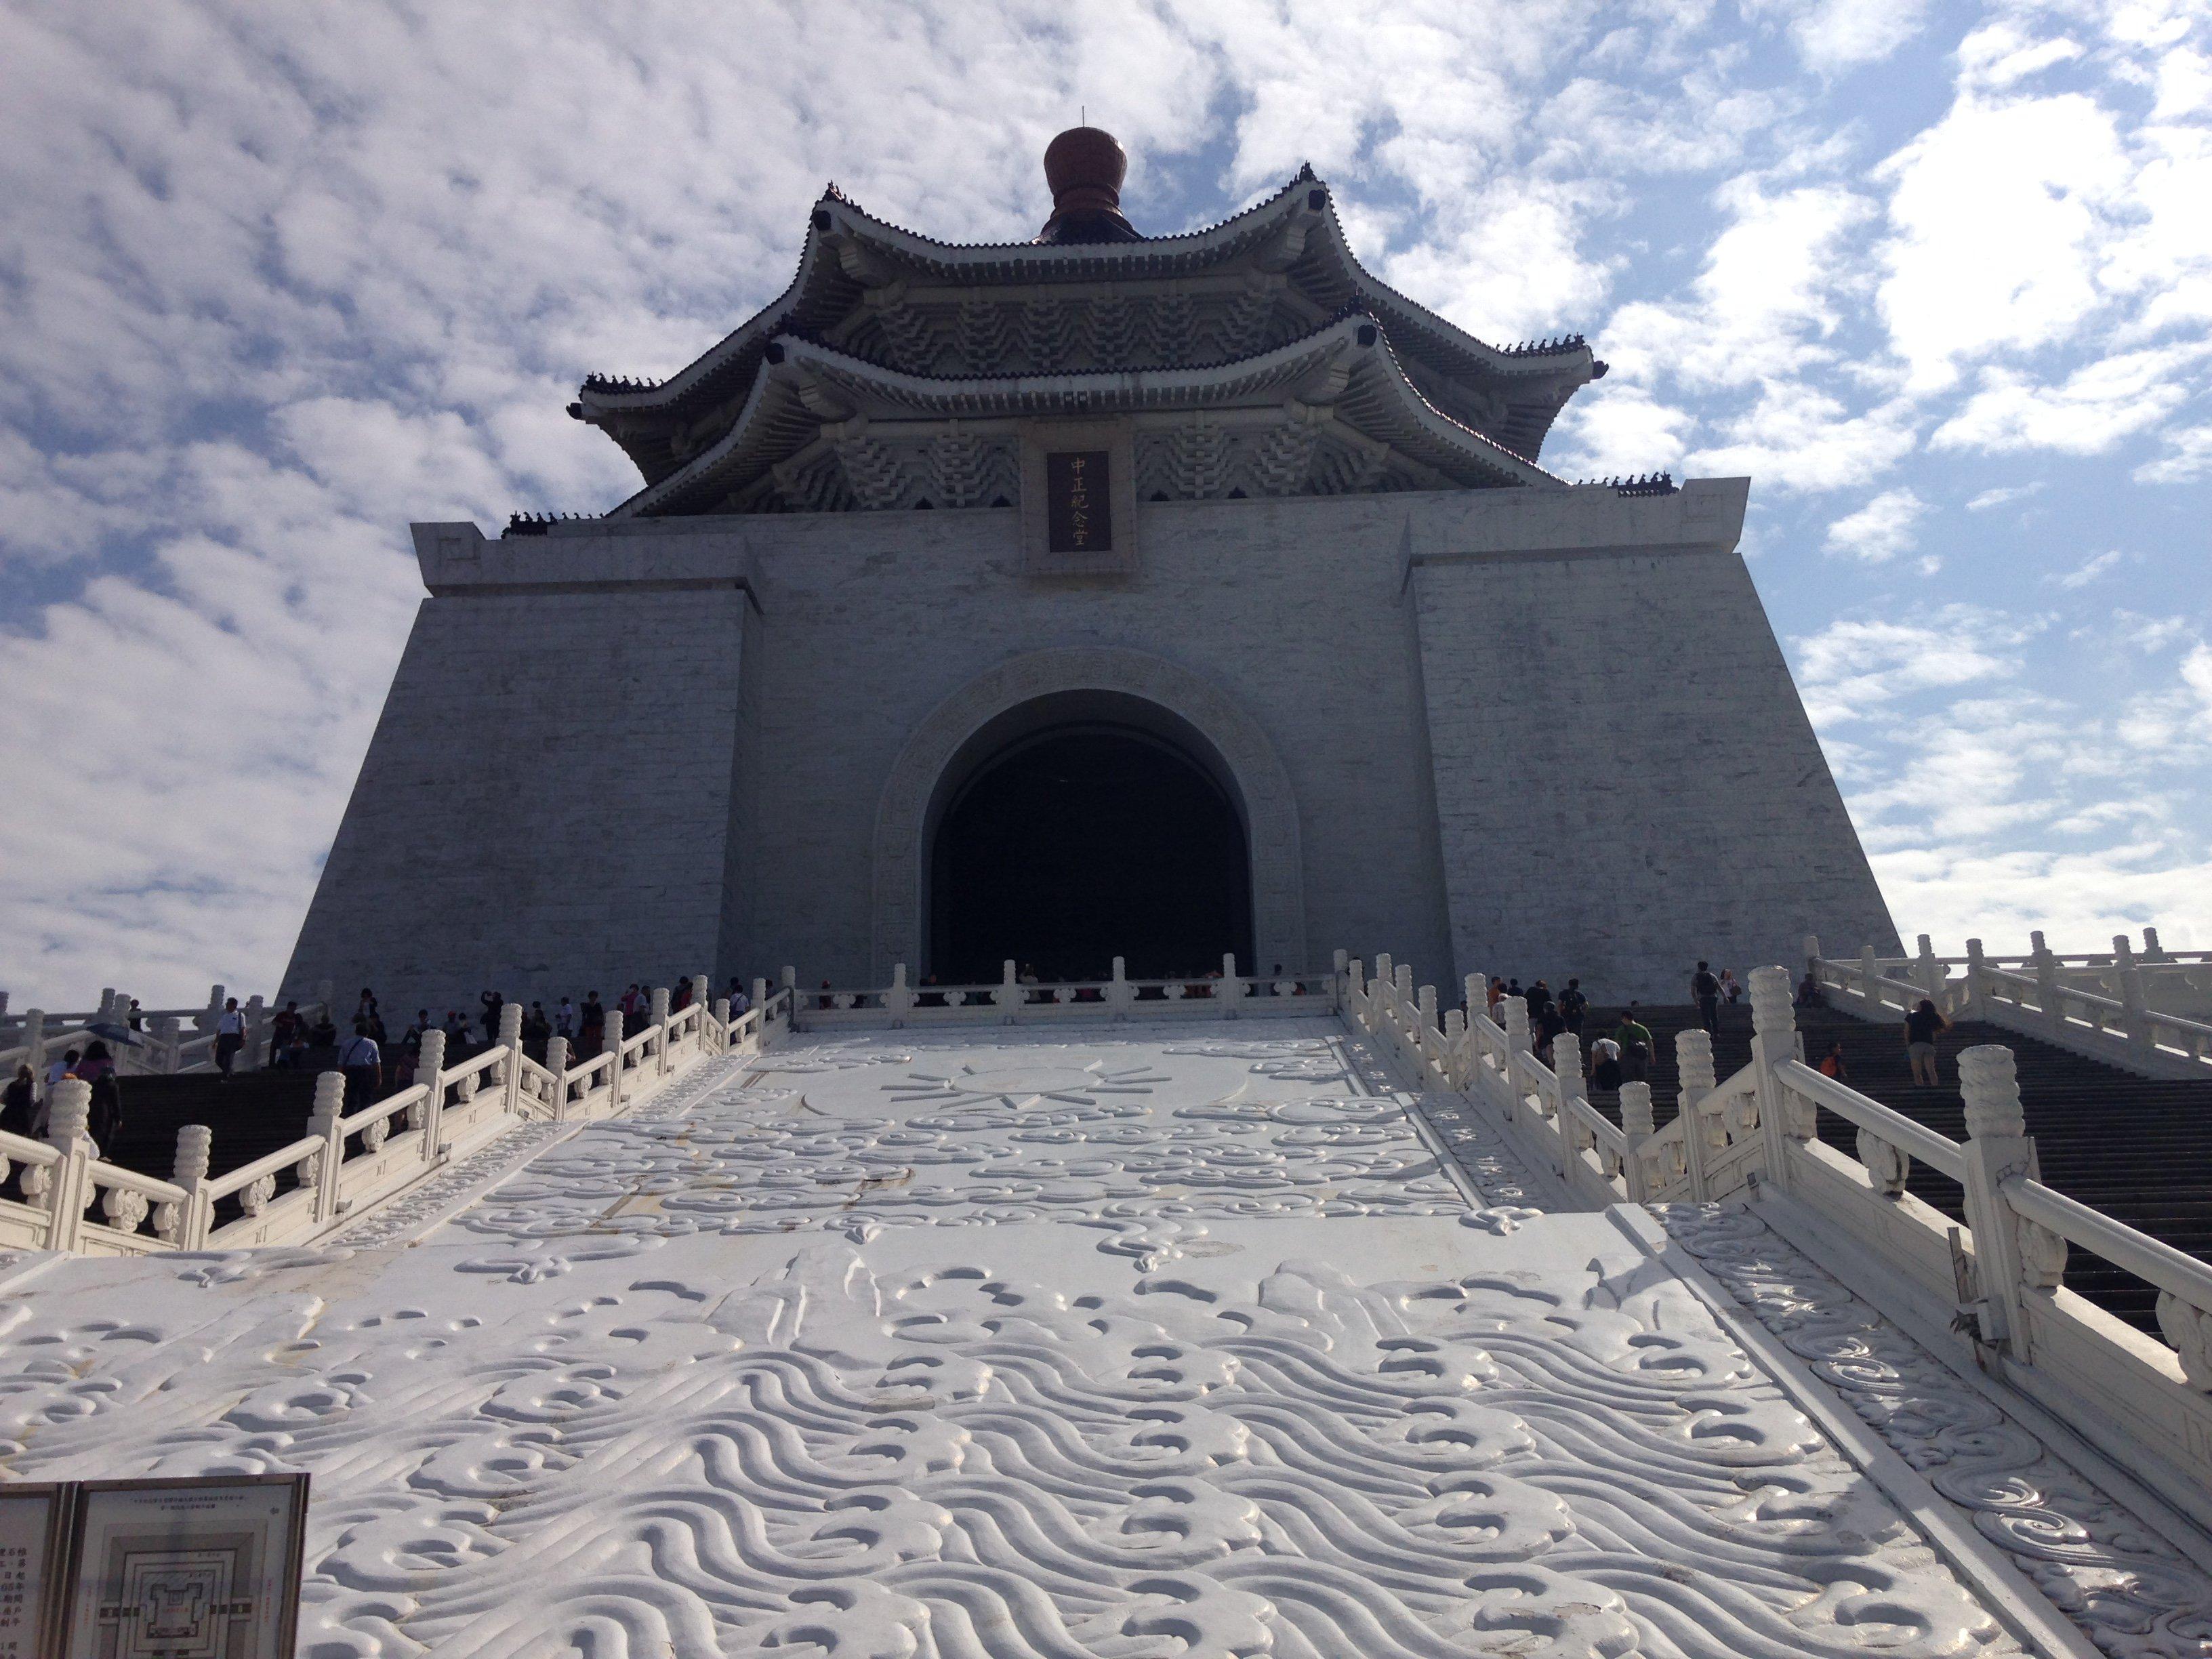 Vakantie in Taiwan